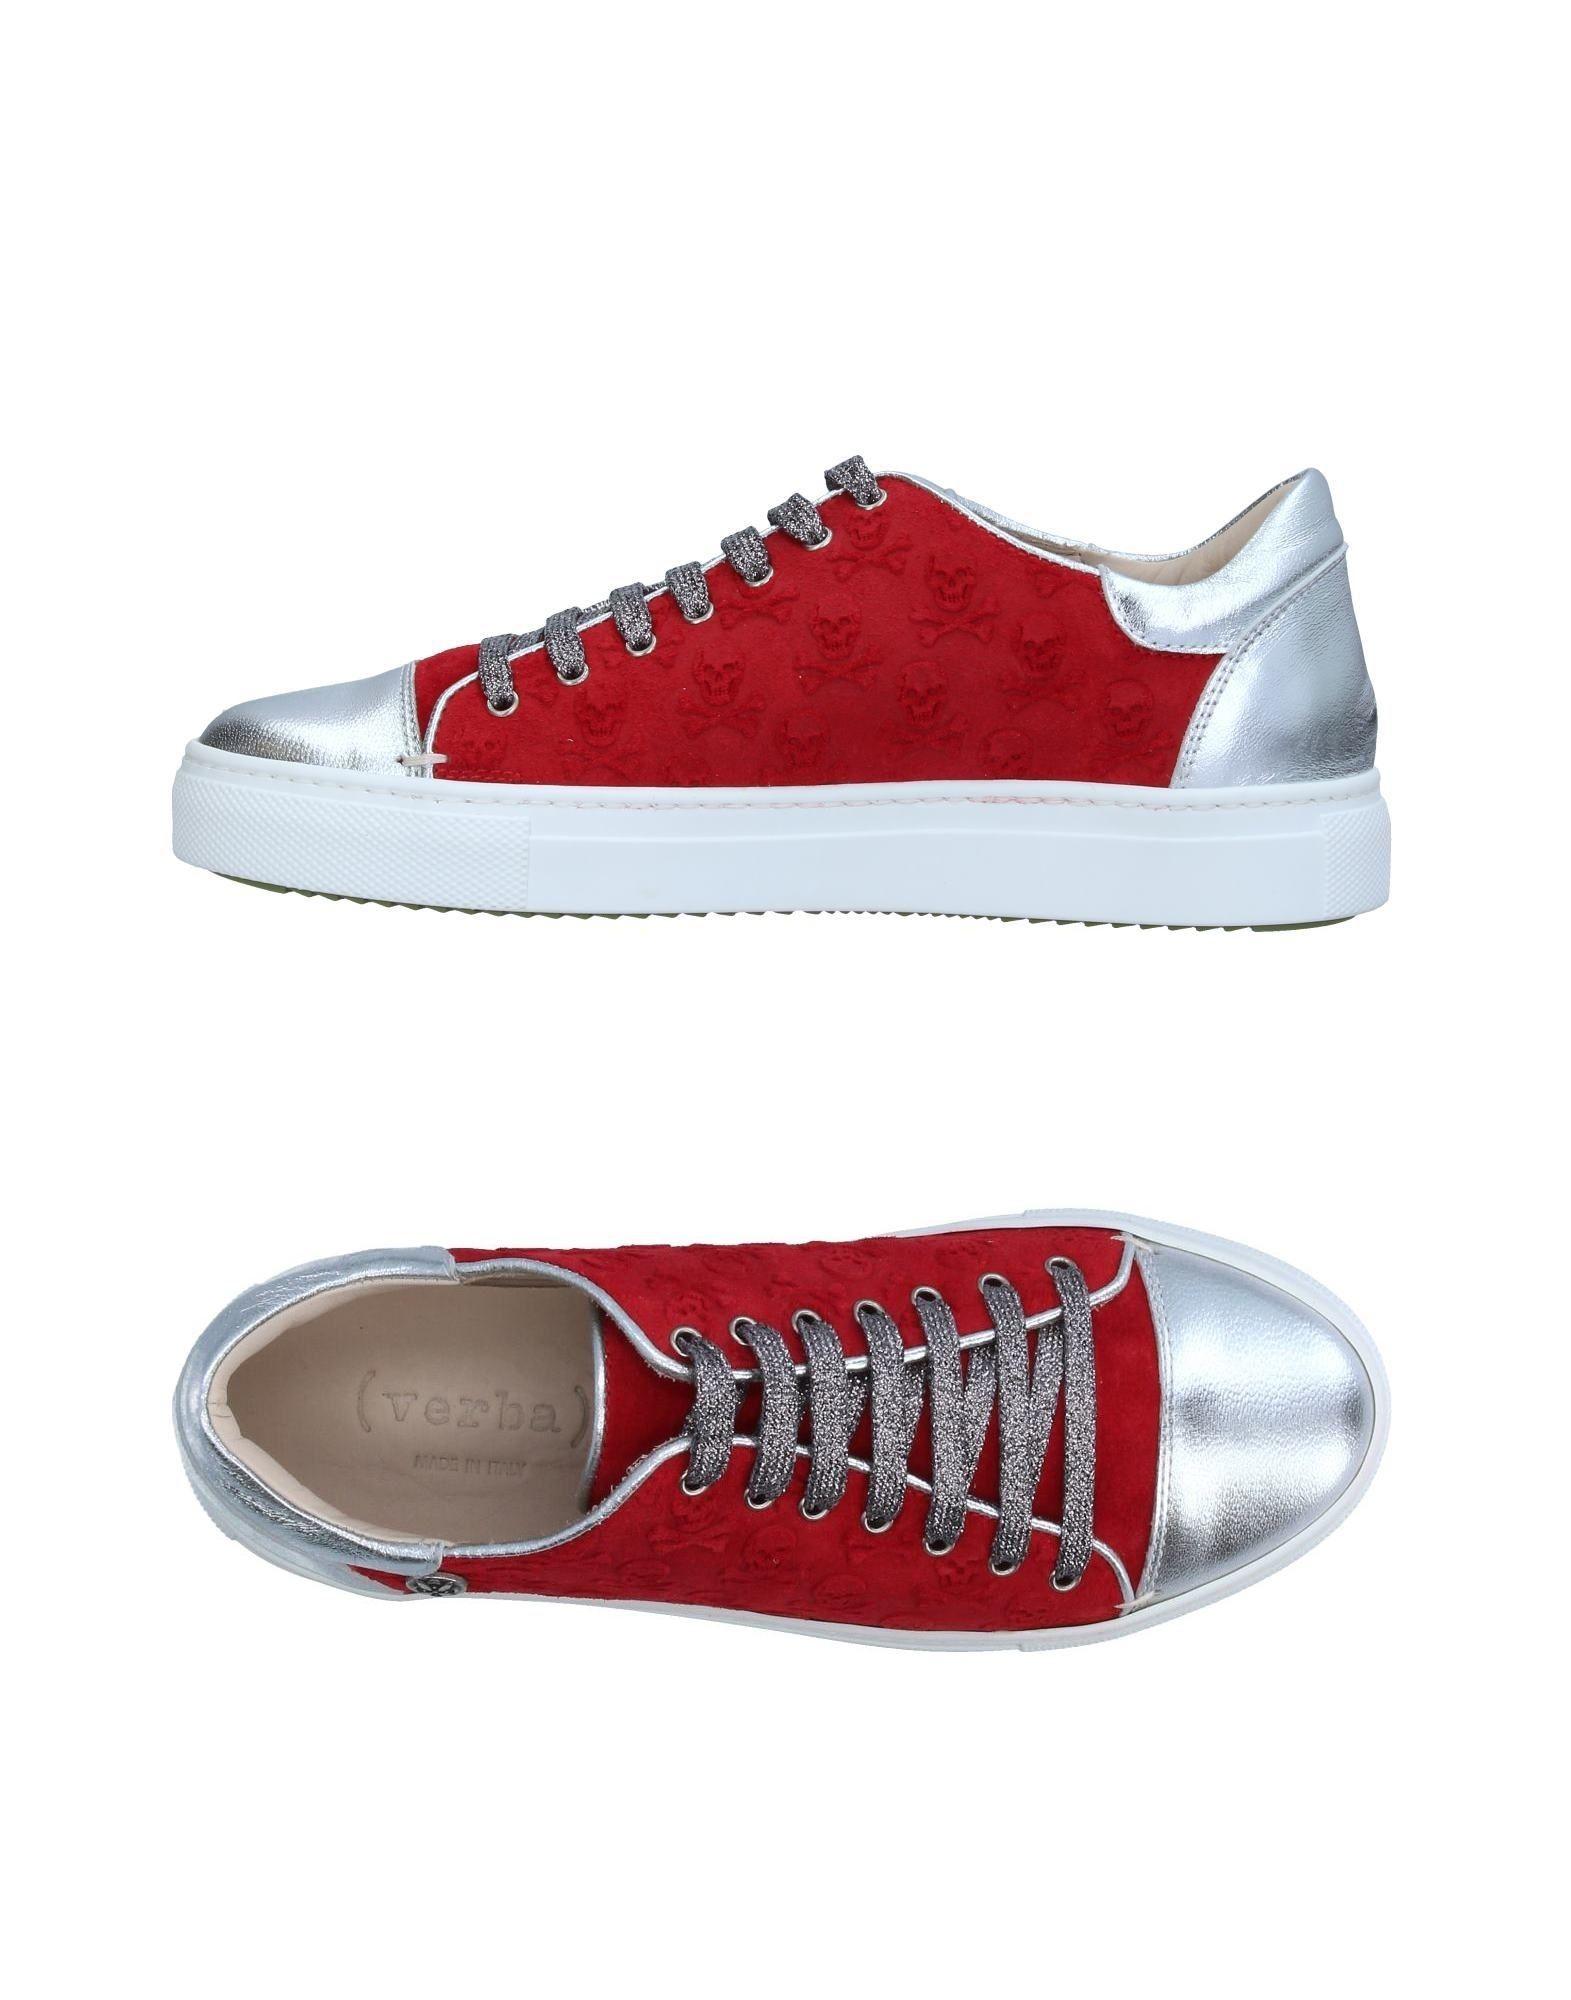 ( Verba ) Sneakers Damen  11361843EN Gute Qualität beliebte Schuhe